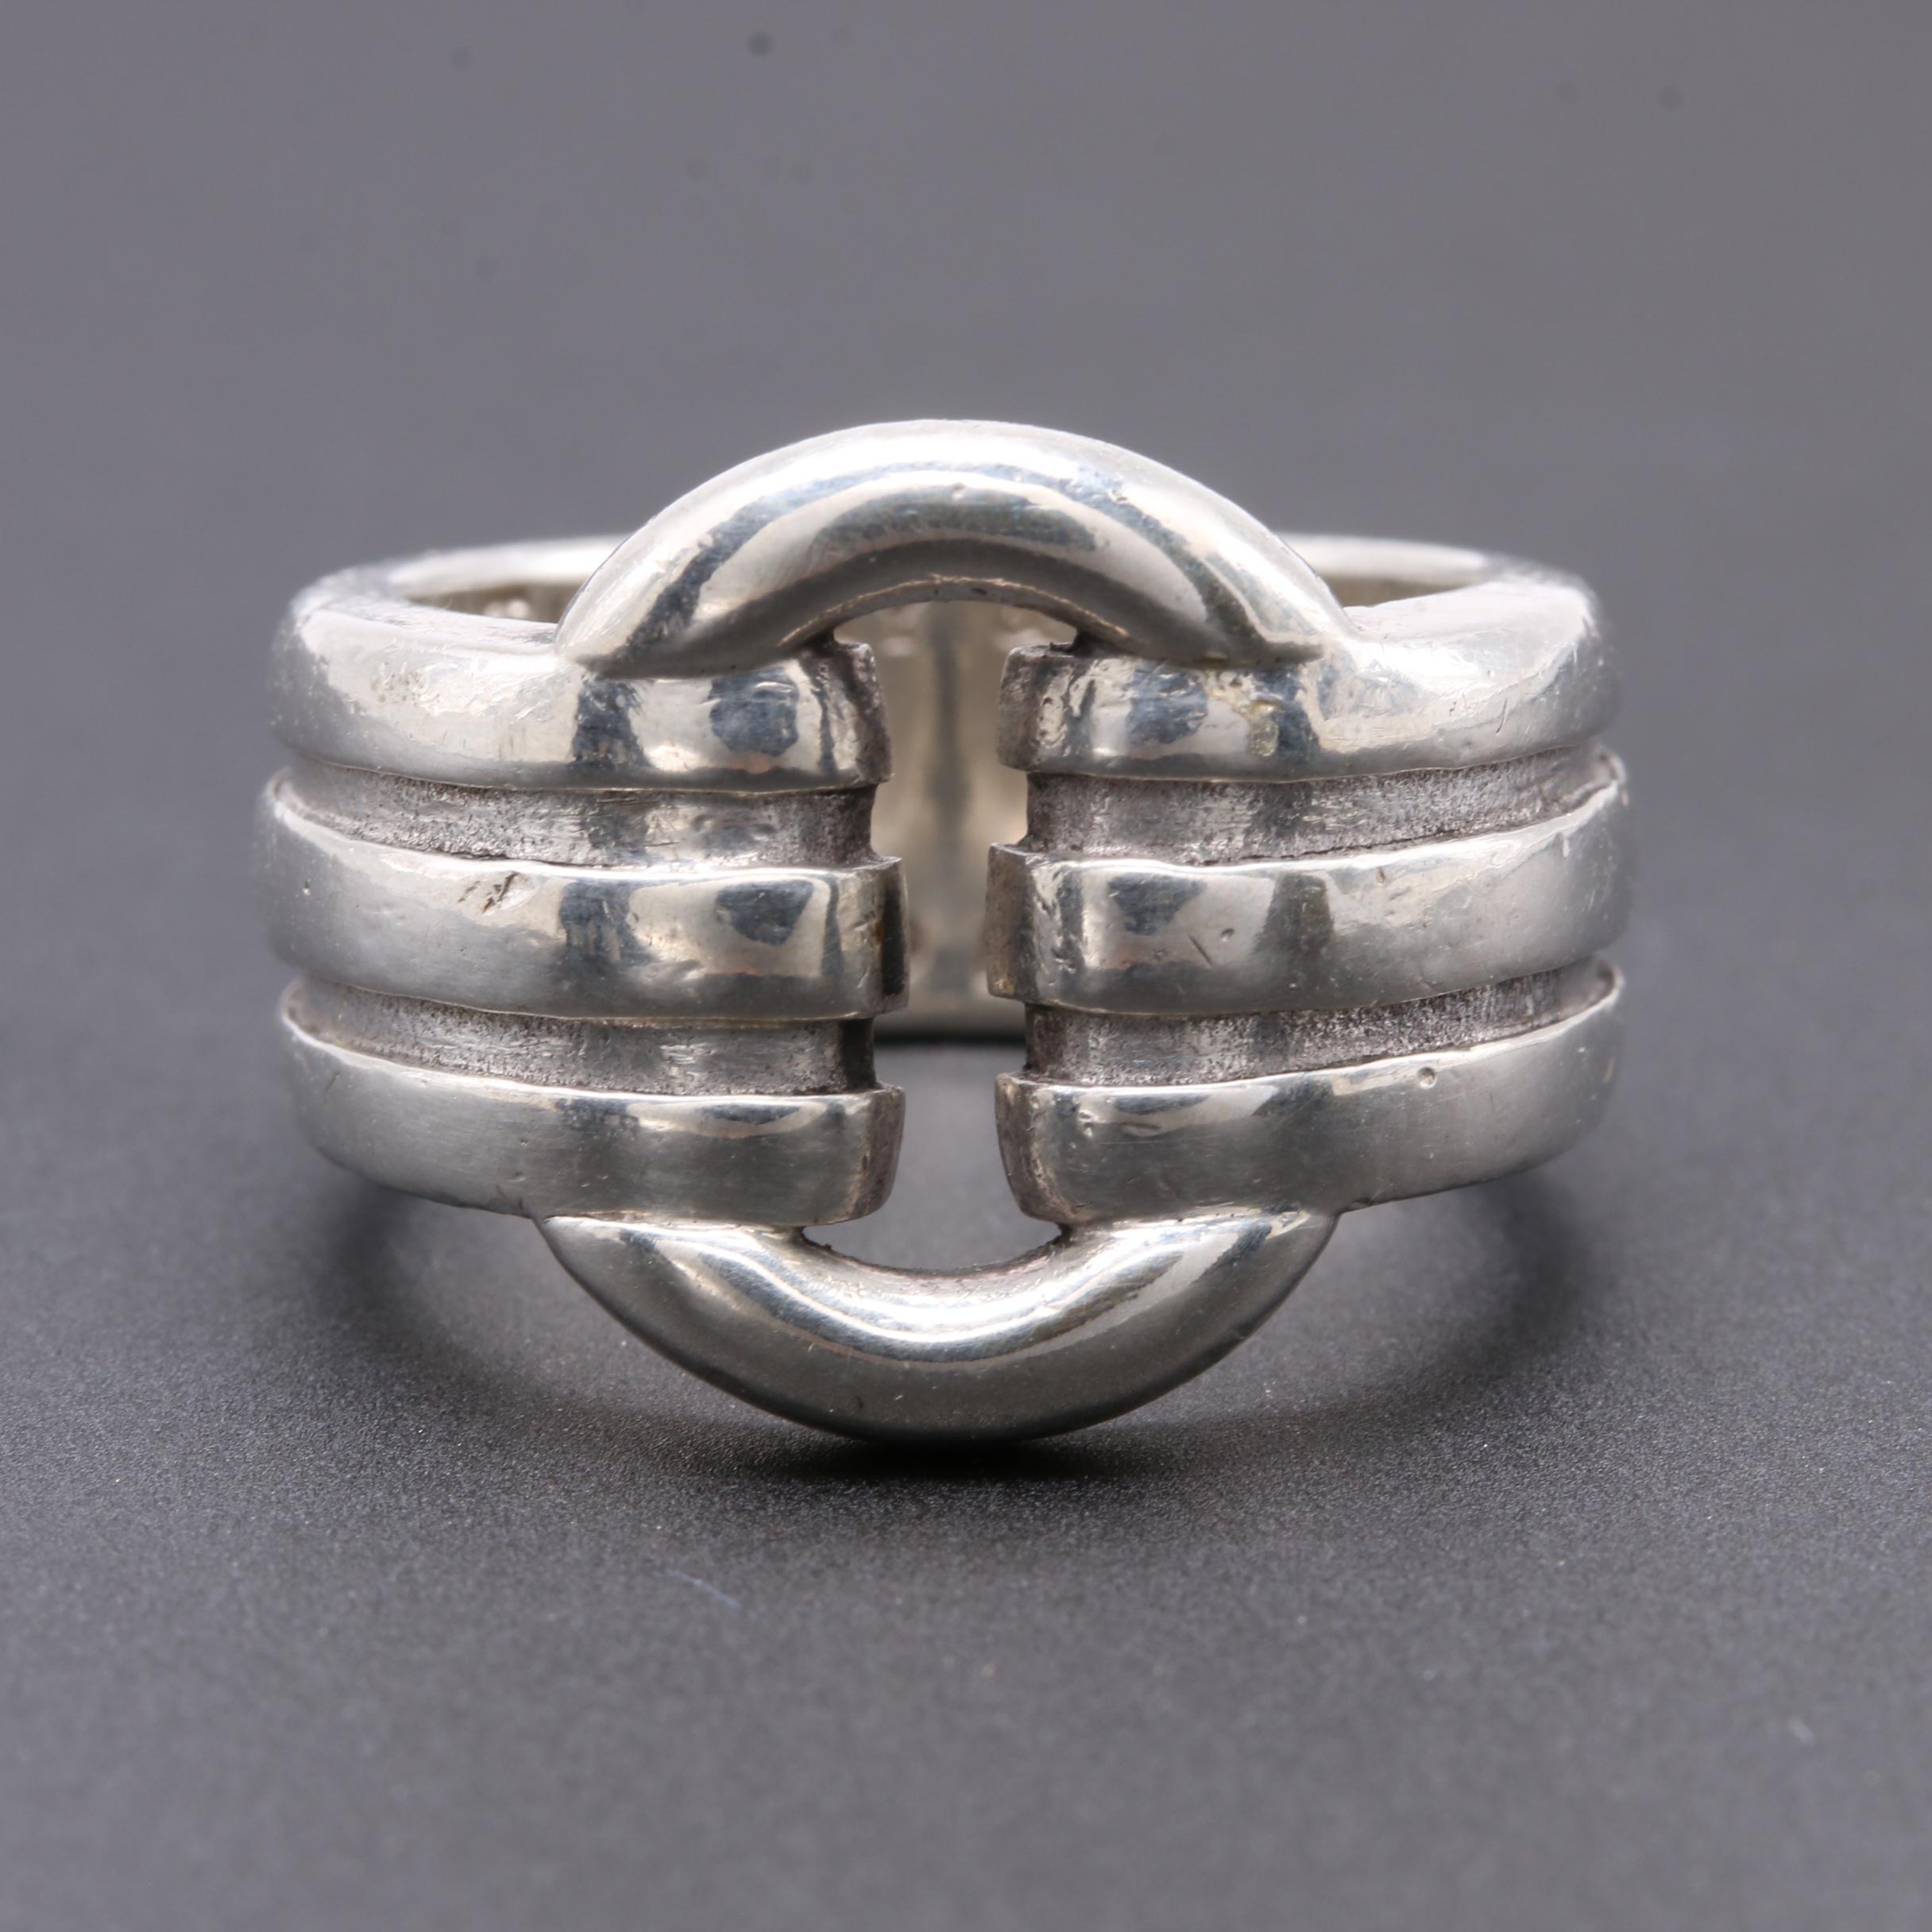 Tiffany & Co. Sterling Silver Ridged Ring